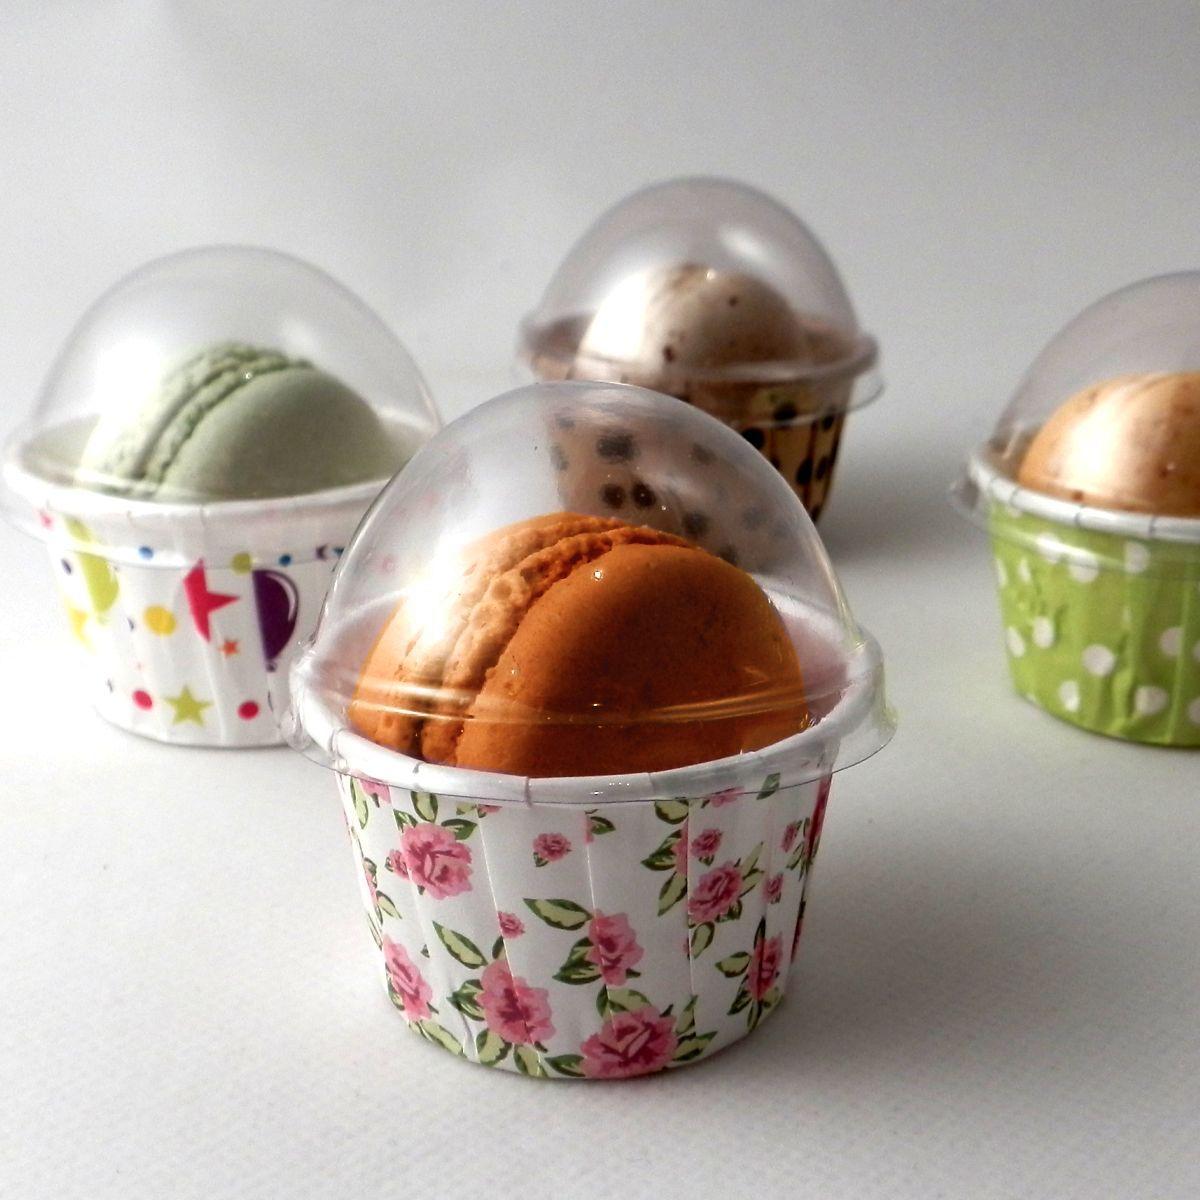 macaron-paper-domes-1200-1.jpg